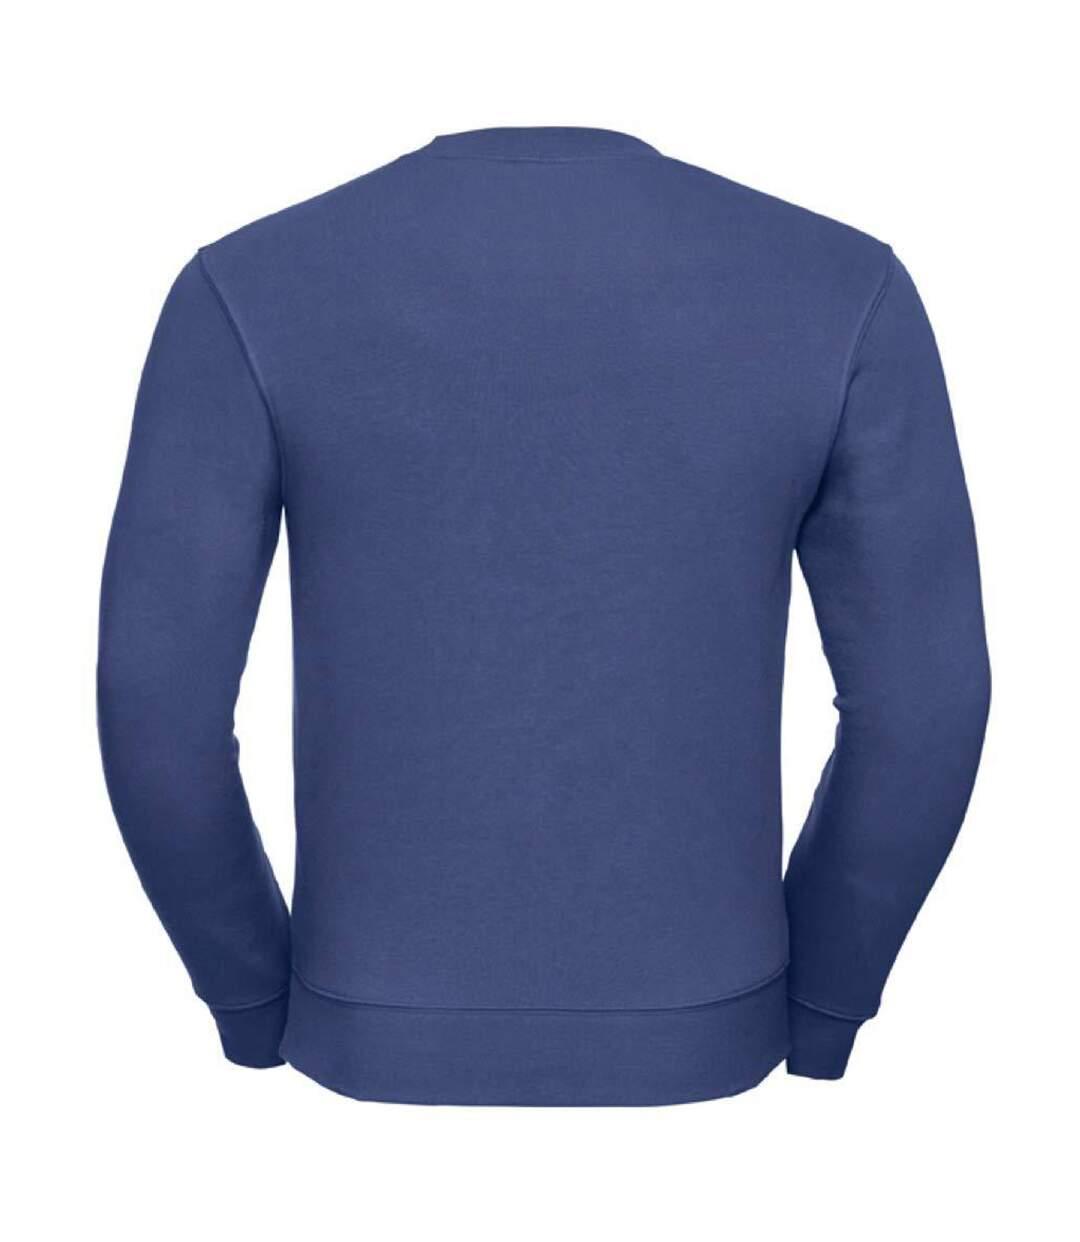 Russell Mens Authentic Sweatshirt (Slimmer Cut) (Bright Royal) - UTBC2067